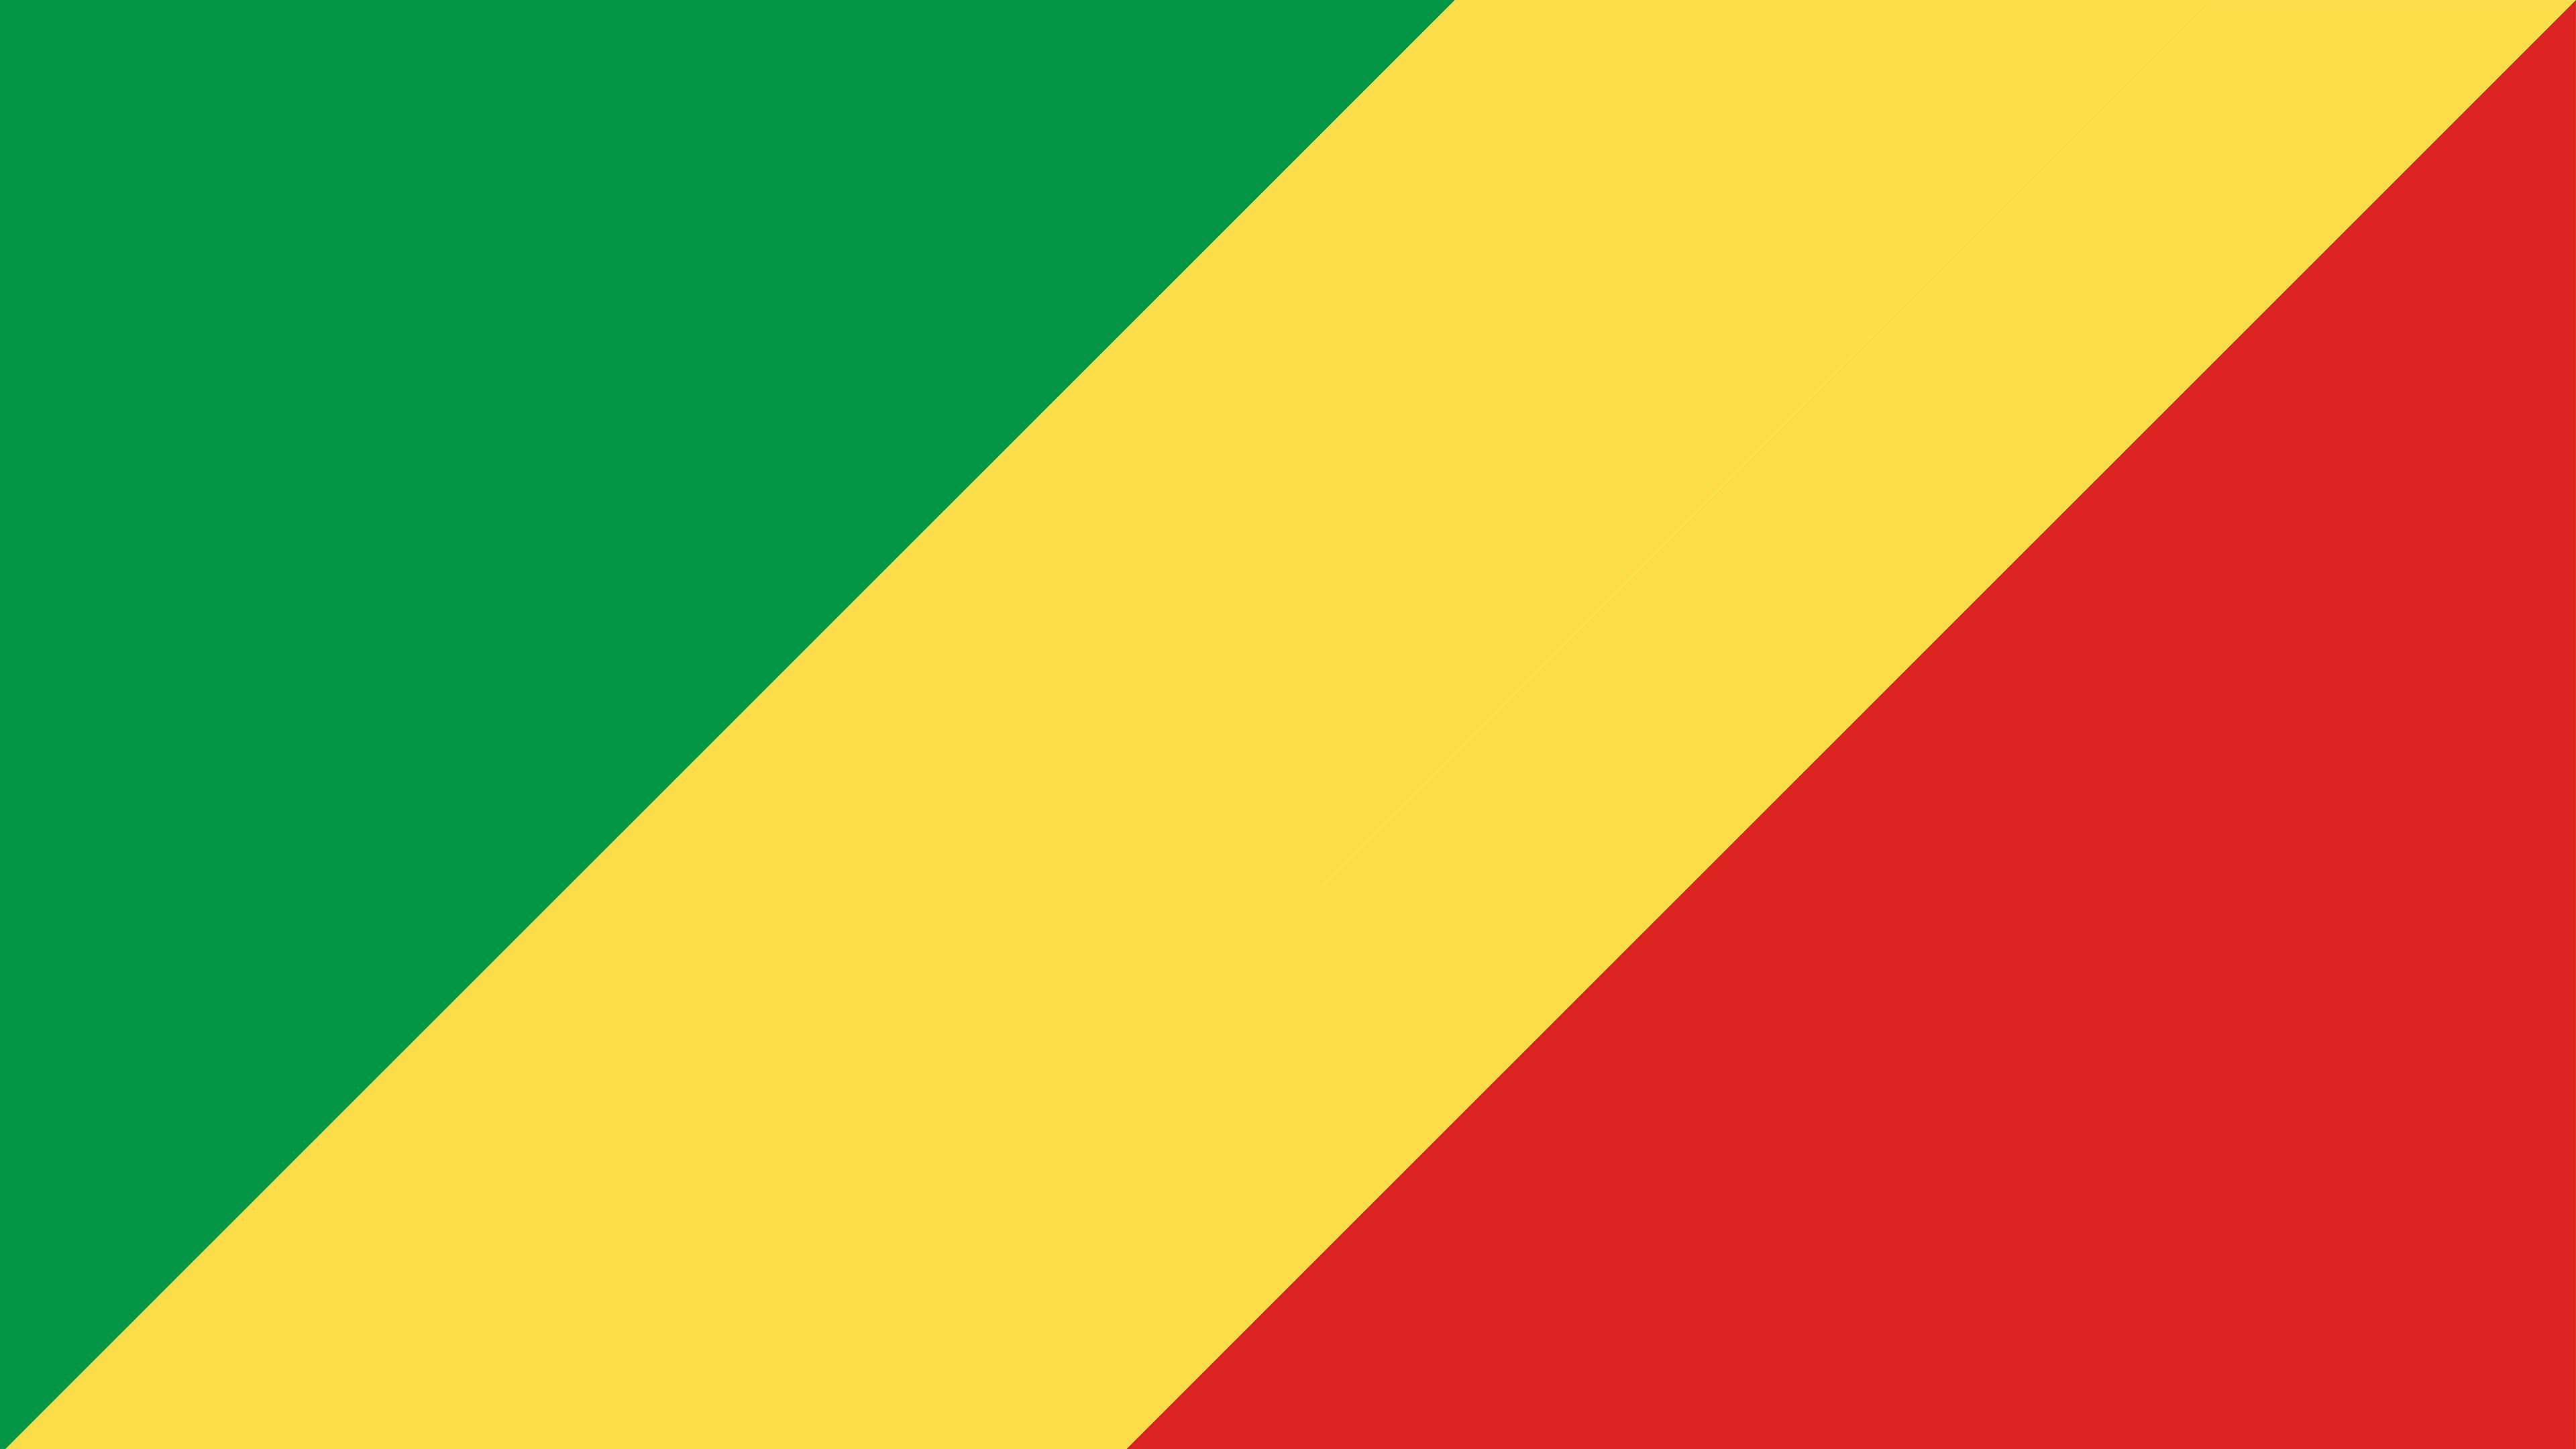 republic of the congo flag uhd 4k wallpaper